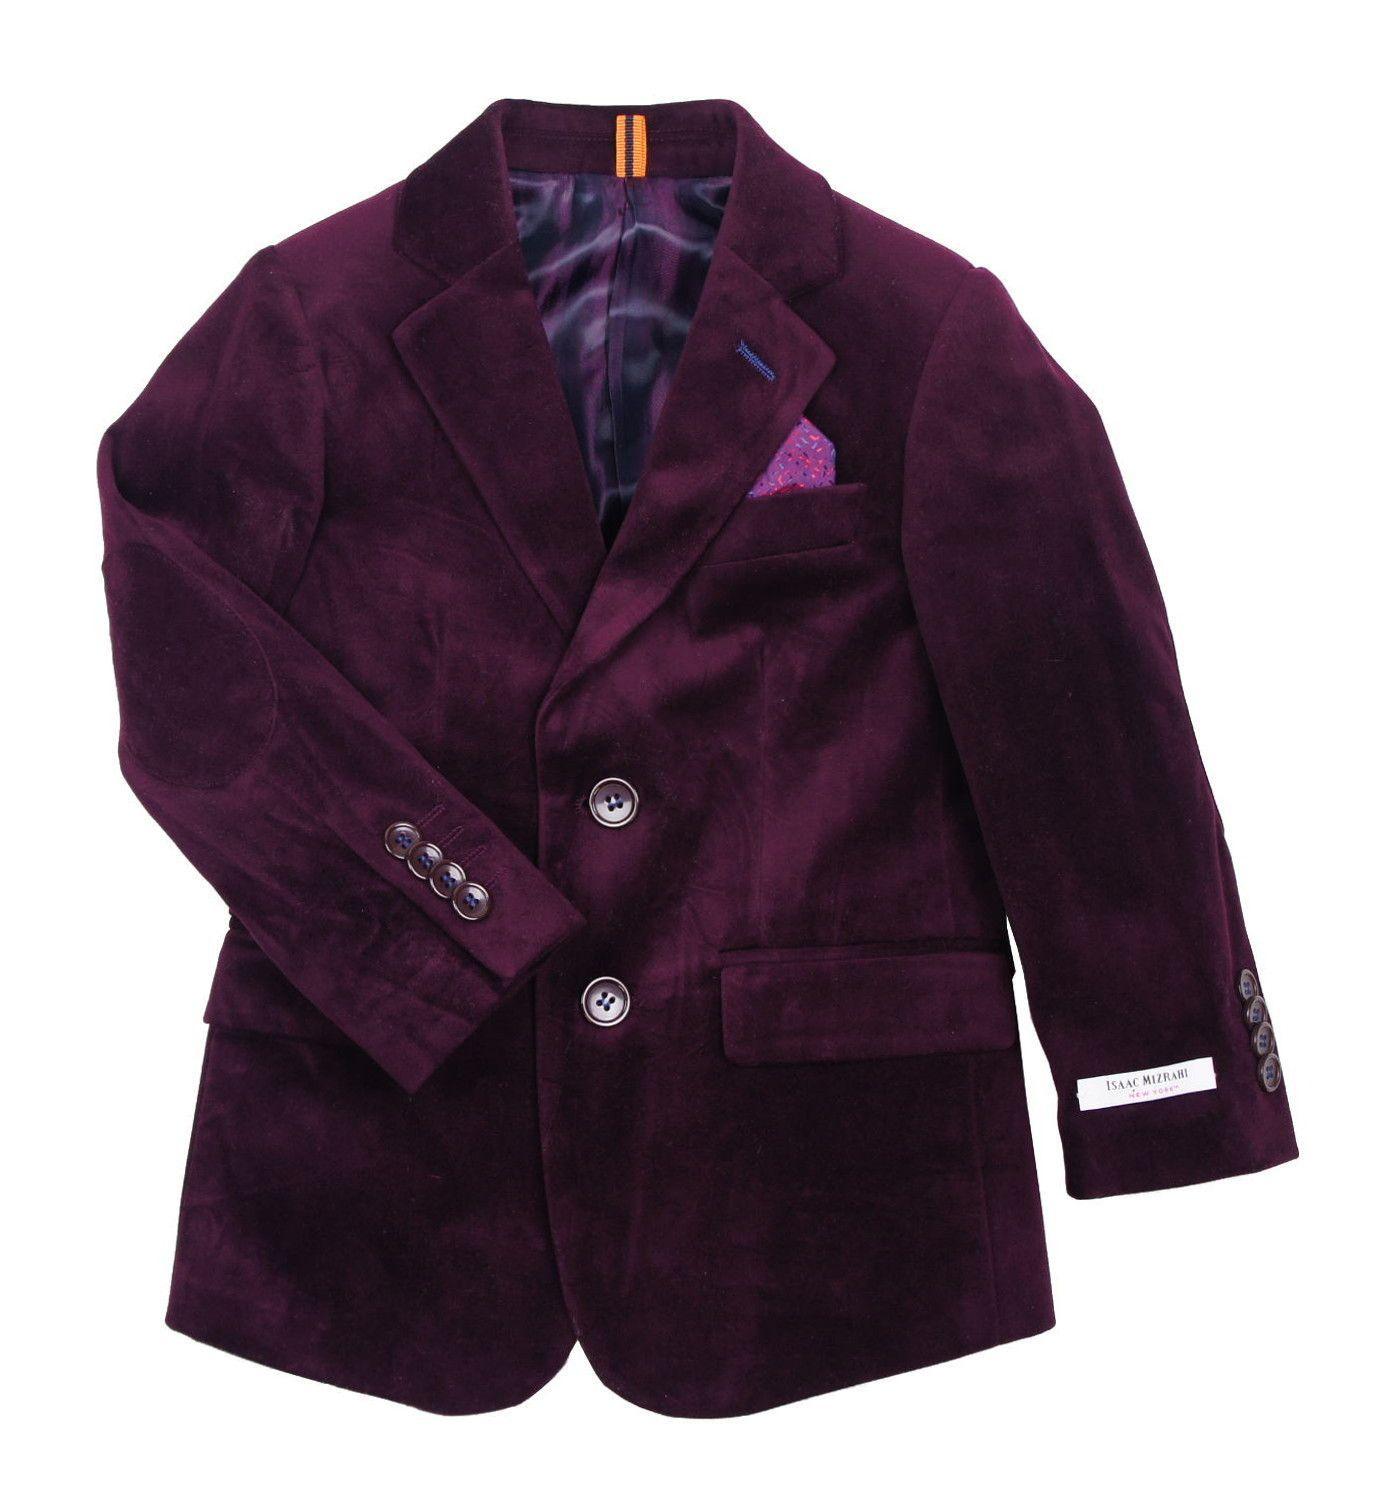 Isaac Mizrahi Boys Burgundy Velvet Blazer